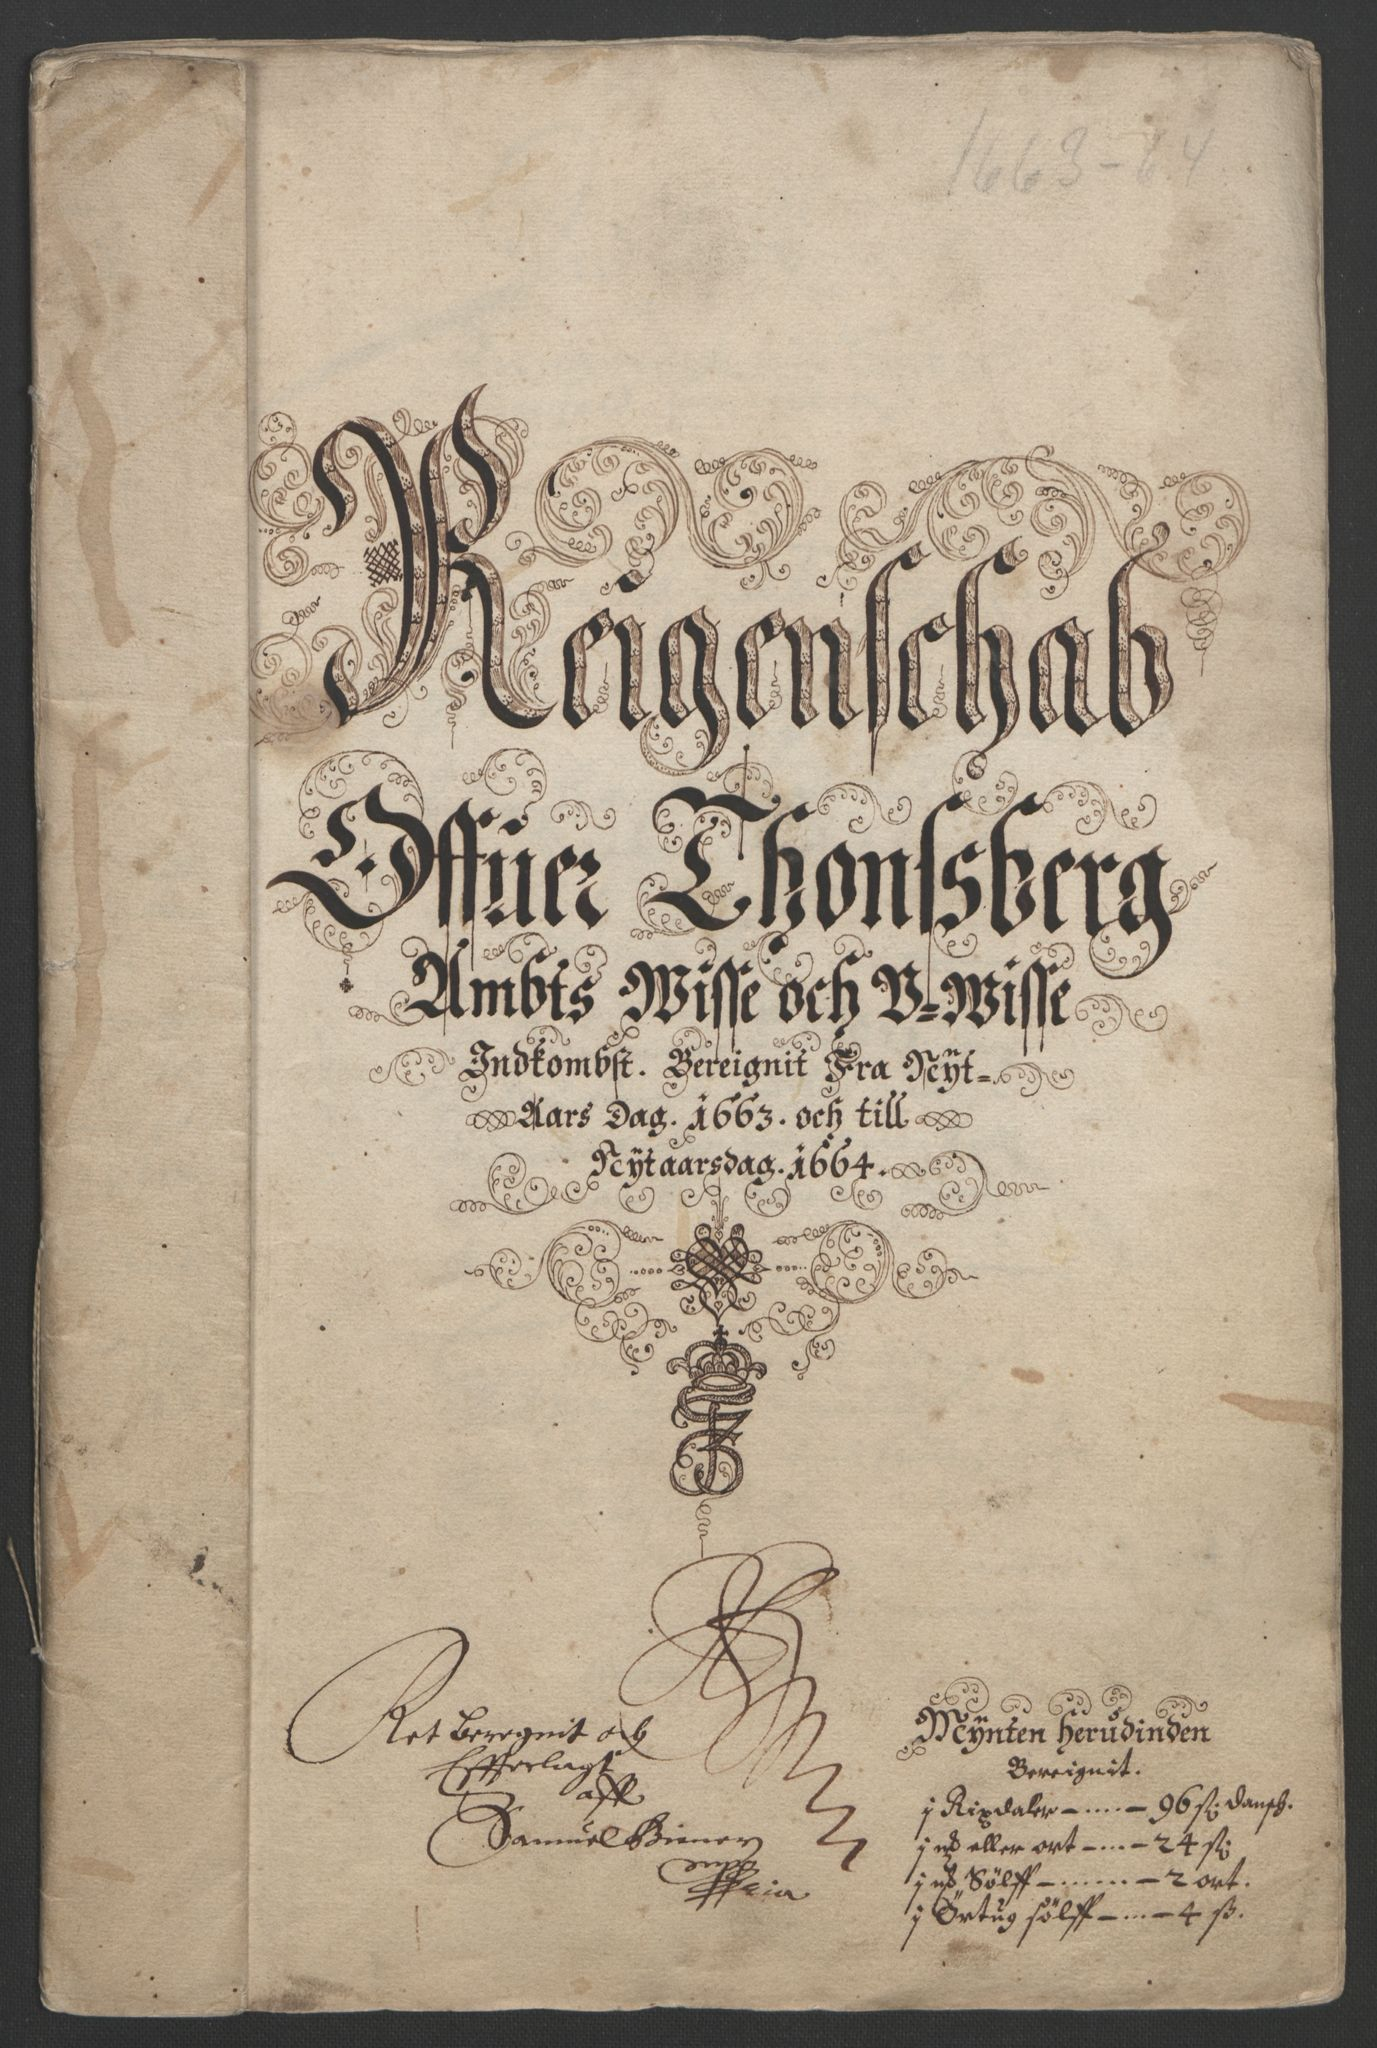 RA, Rentekammeret inntil 1814, Reviderte regnskaper, Fogderegnskap, R32/L1838: Fogderegnskap Jarlsberg grevskap, 1661-1663, s. 295